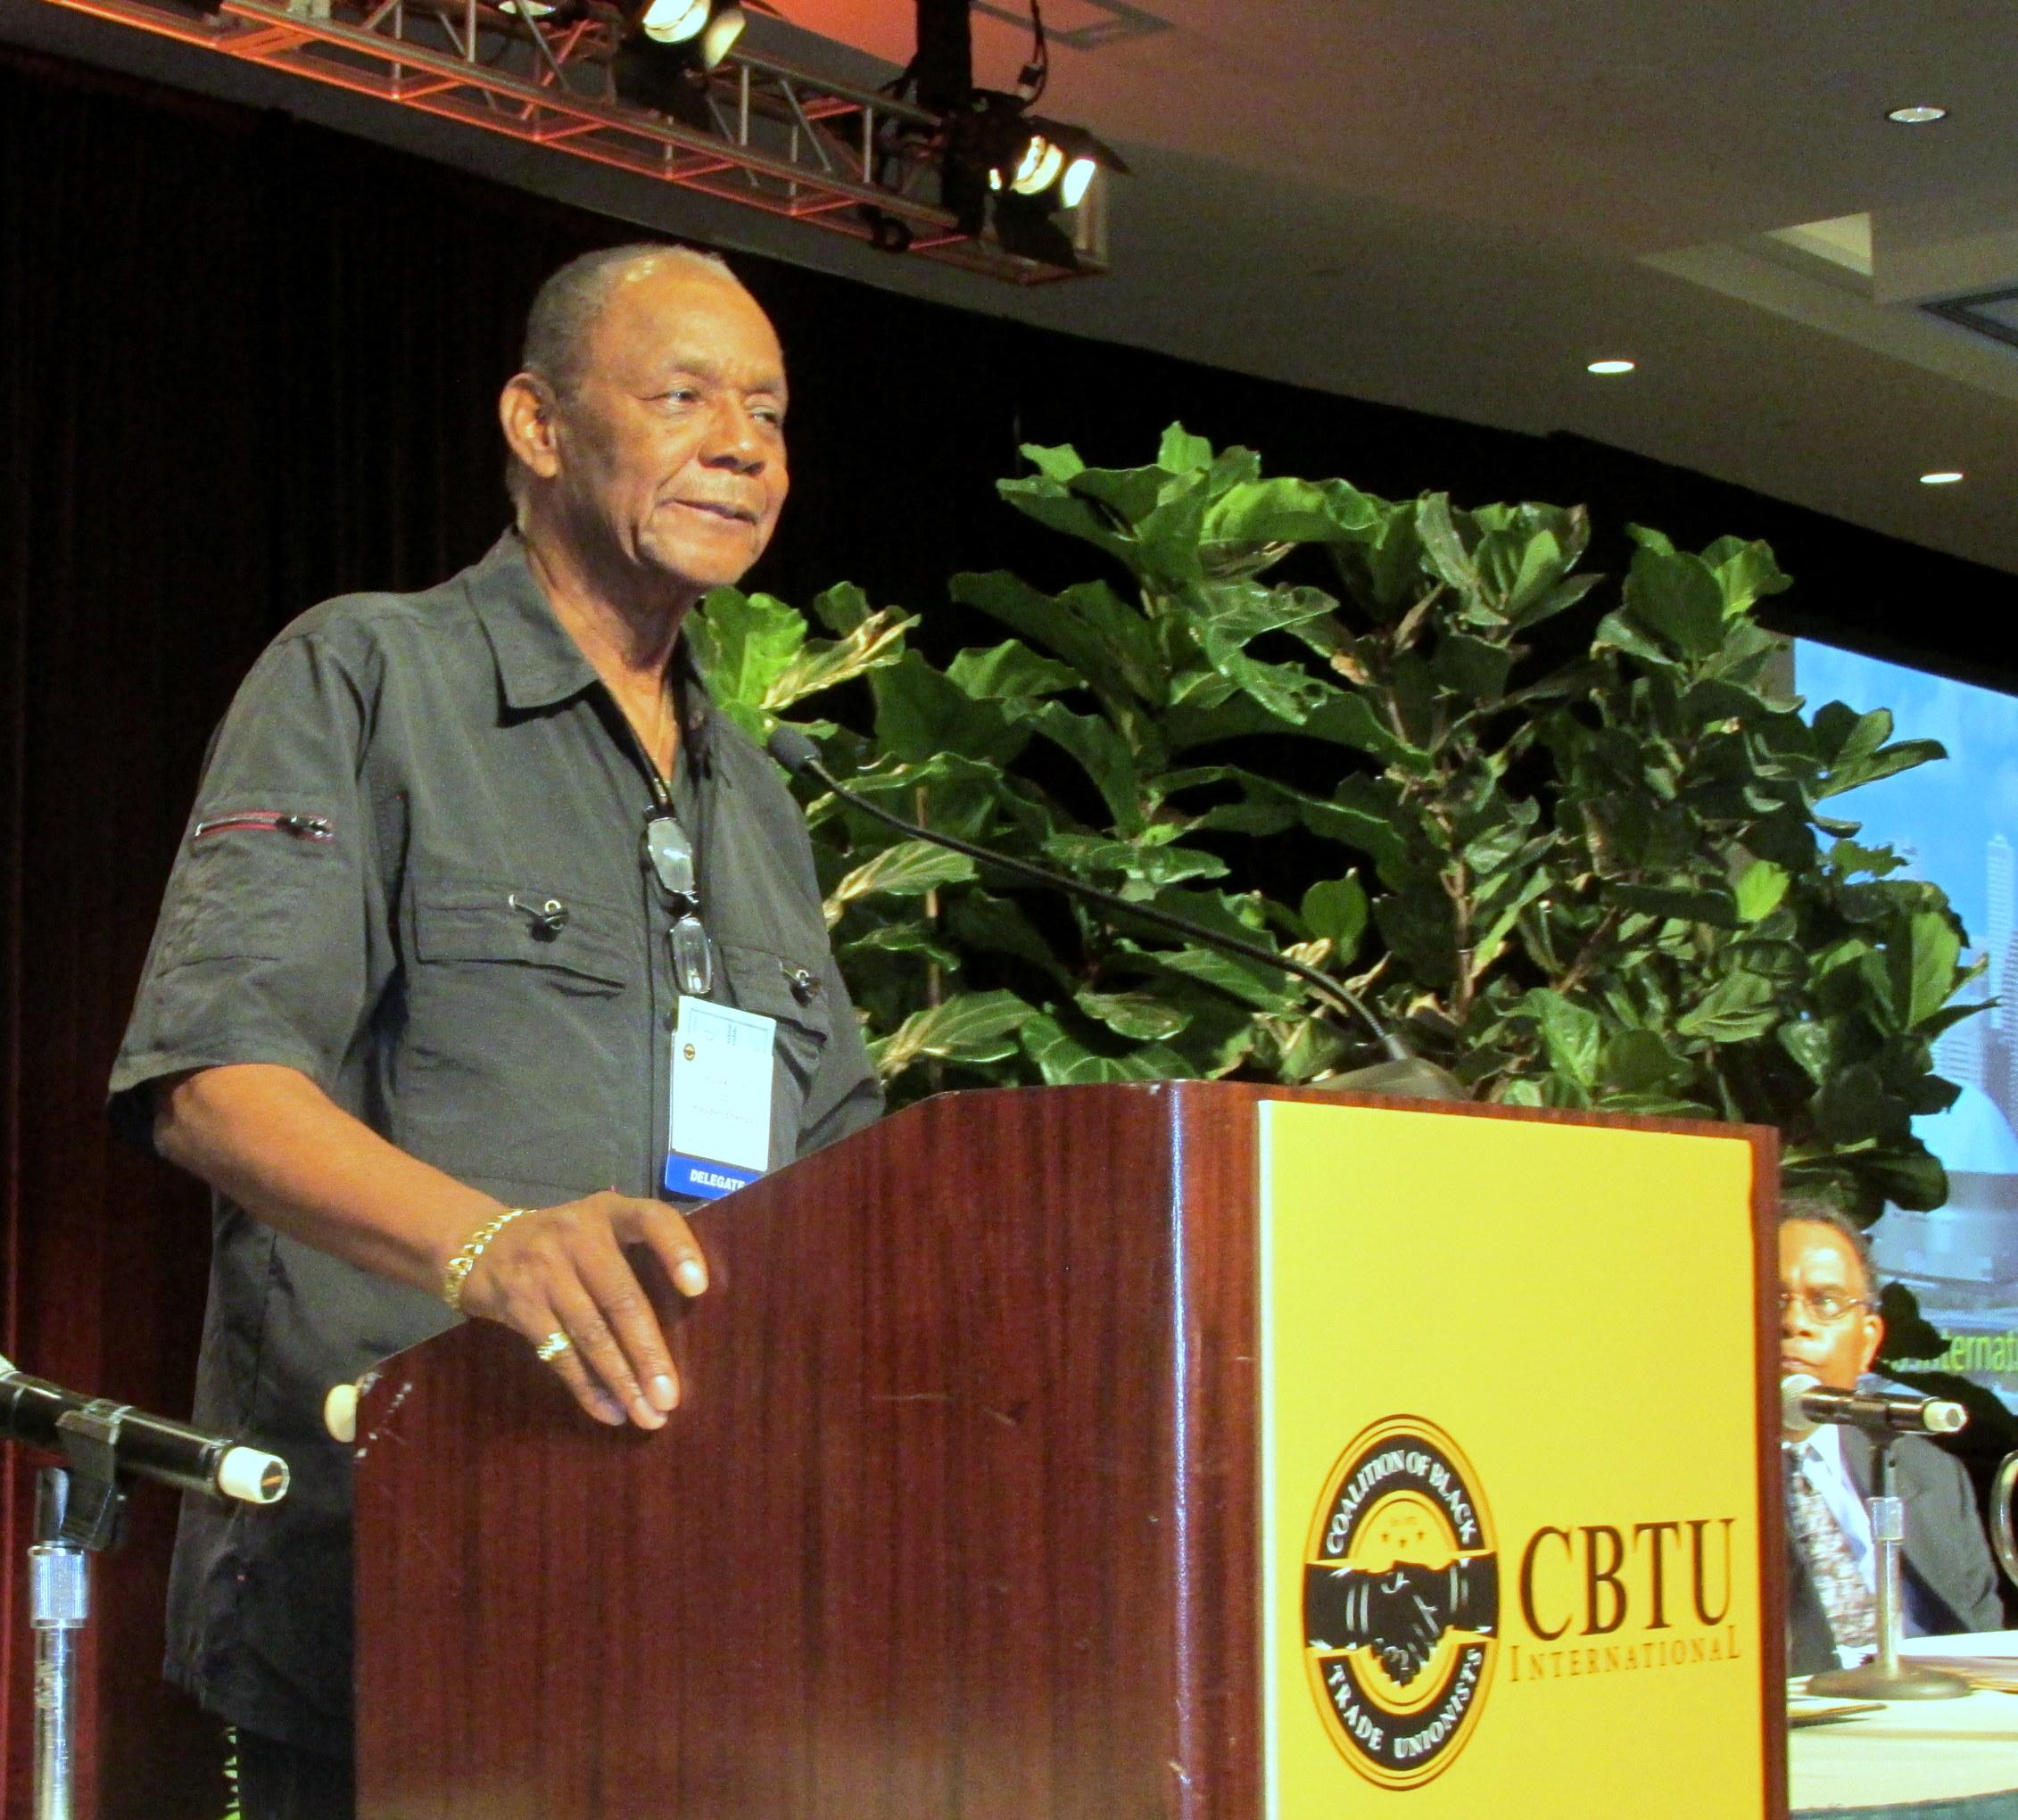 CBTU-Photo-2017-Convention-Bill-Lucy-at-podium